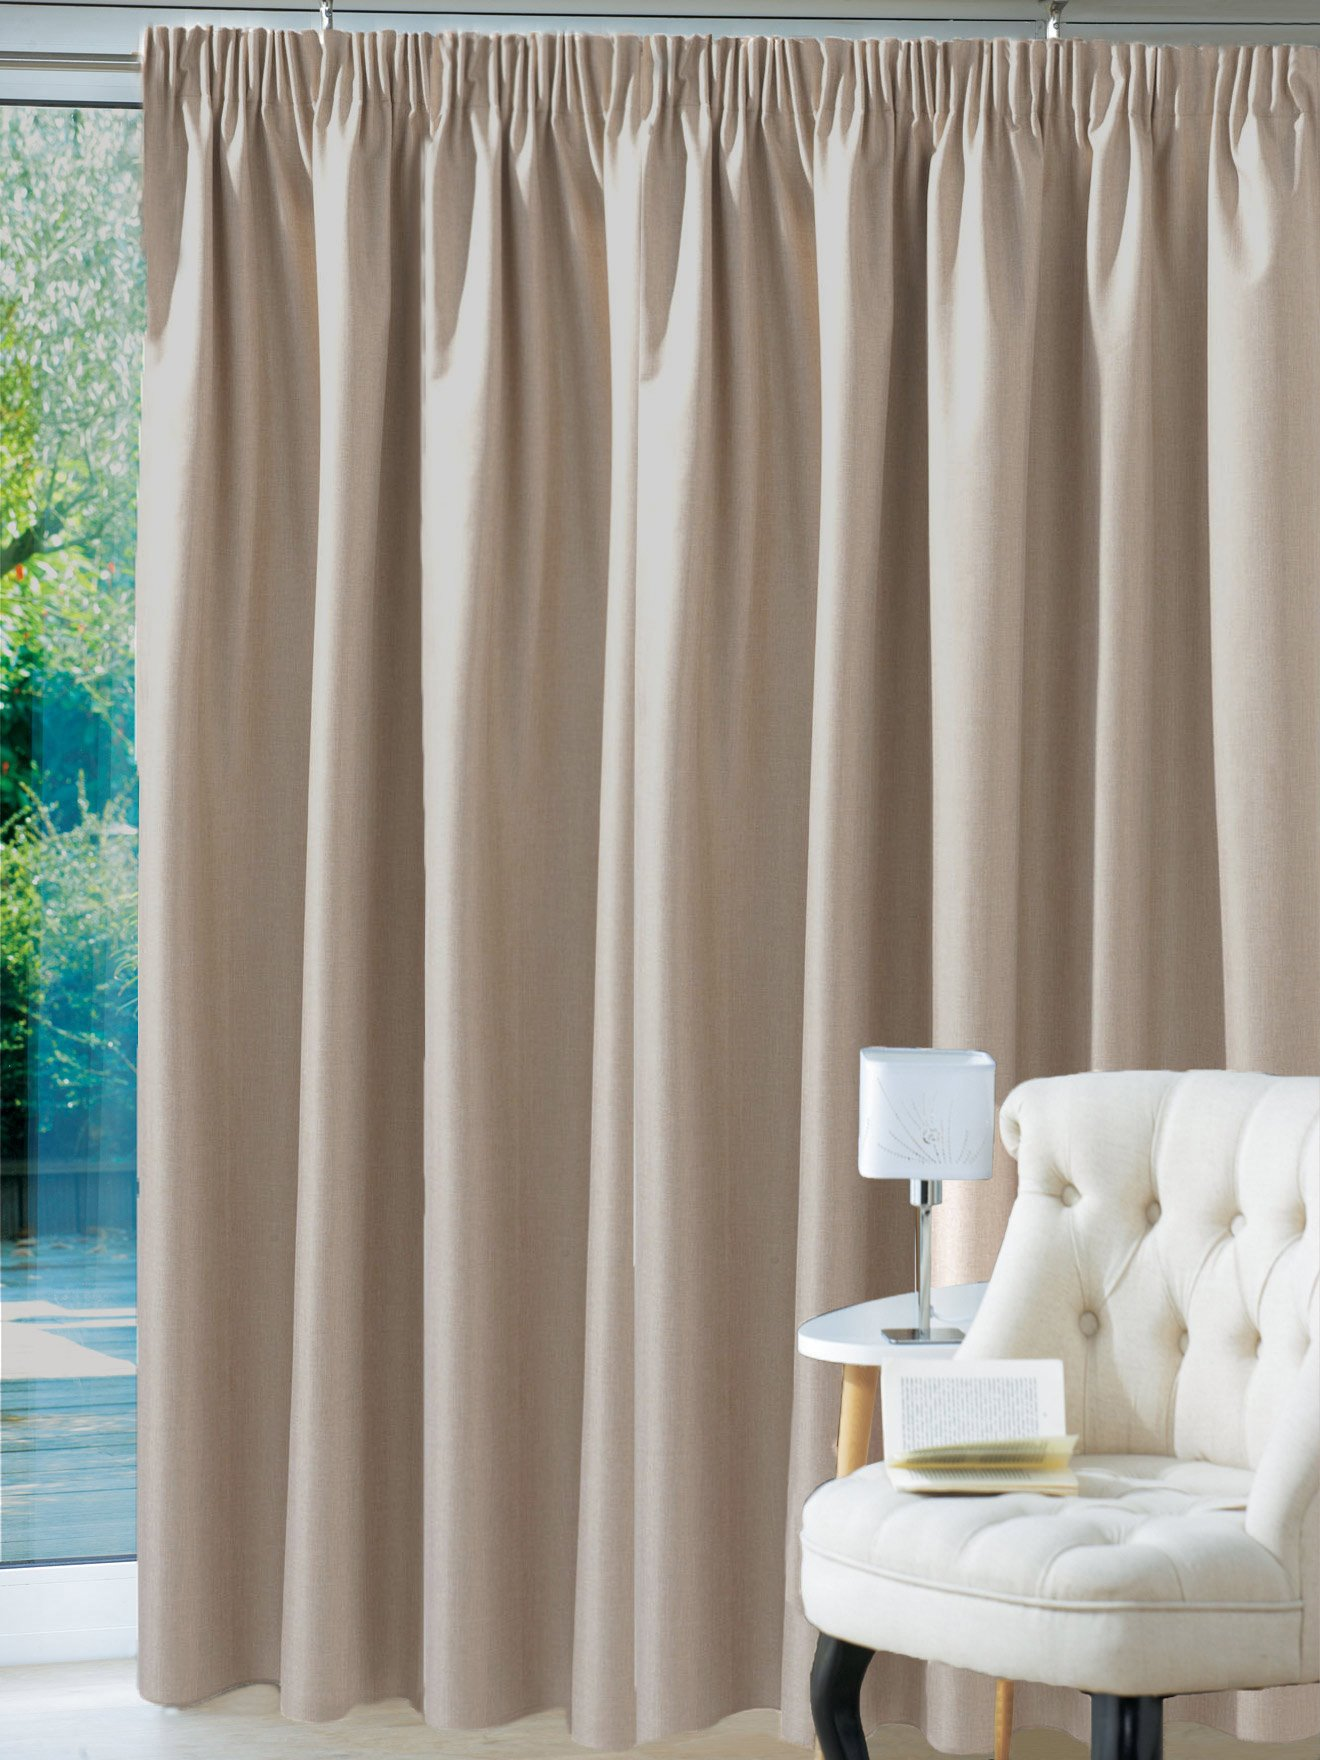 rideau jacquard occultant galon fronceur daxon. Black Bedroom Furniture Sets. Home Design Ideas